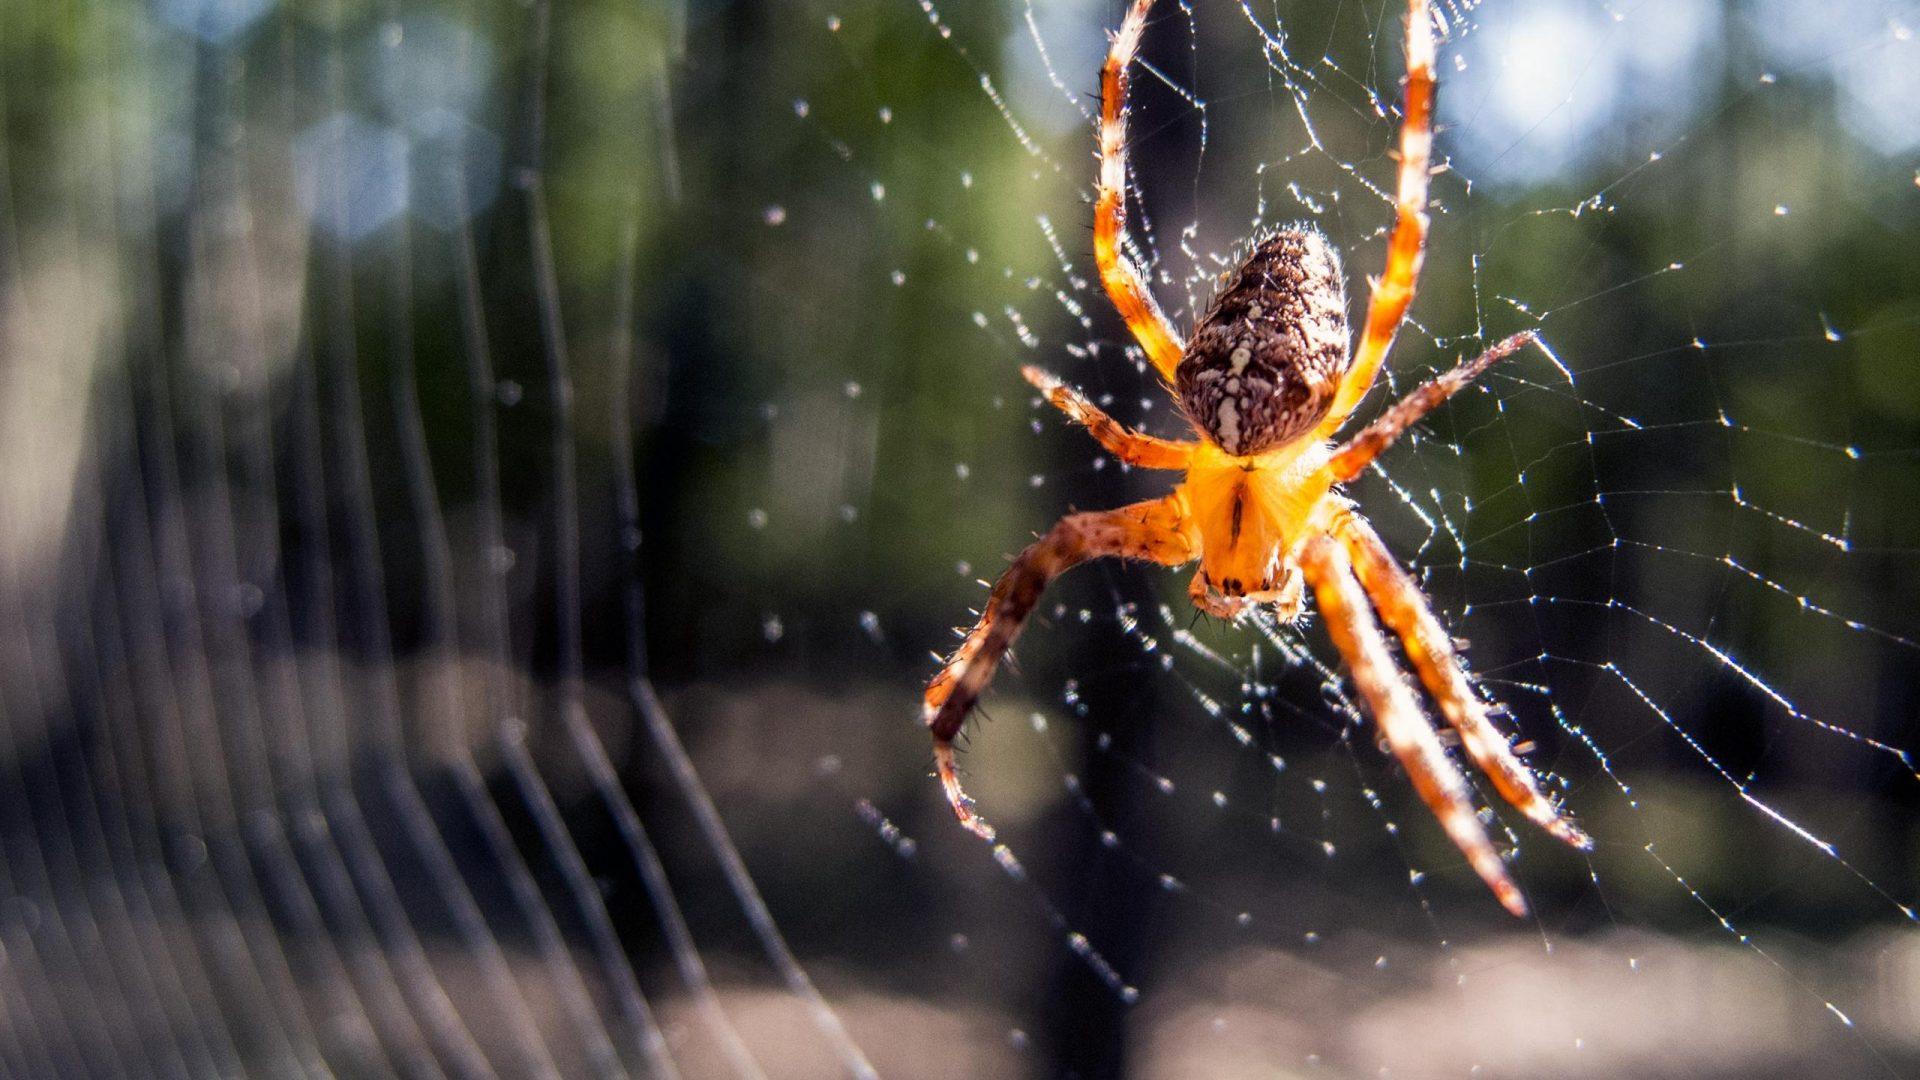 Araignée dans sa toile